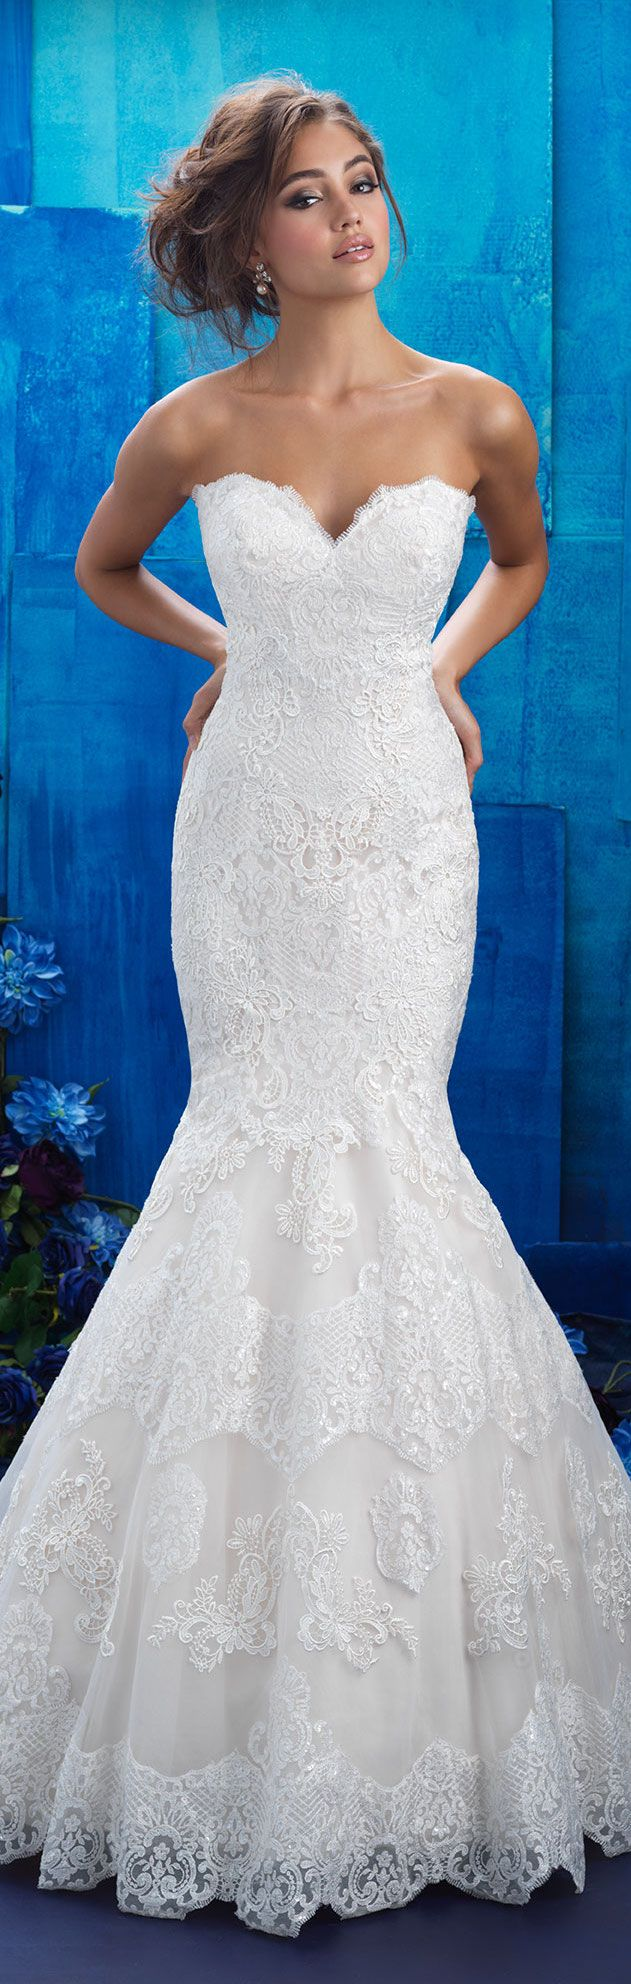 Best 25+ Lace wedding gowns ideas on Pinterest | Lace ...